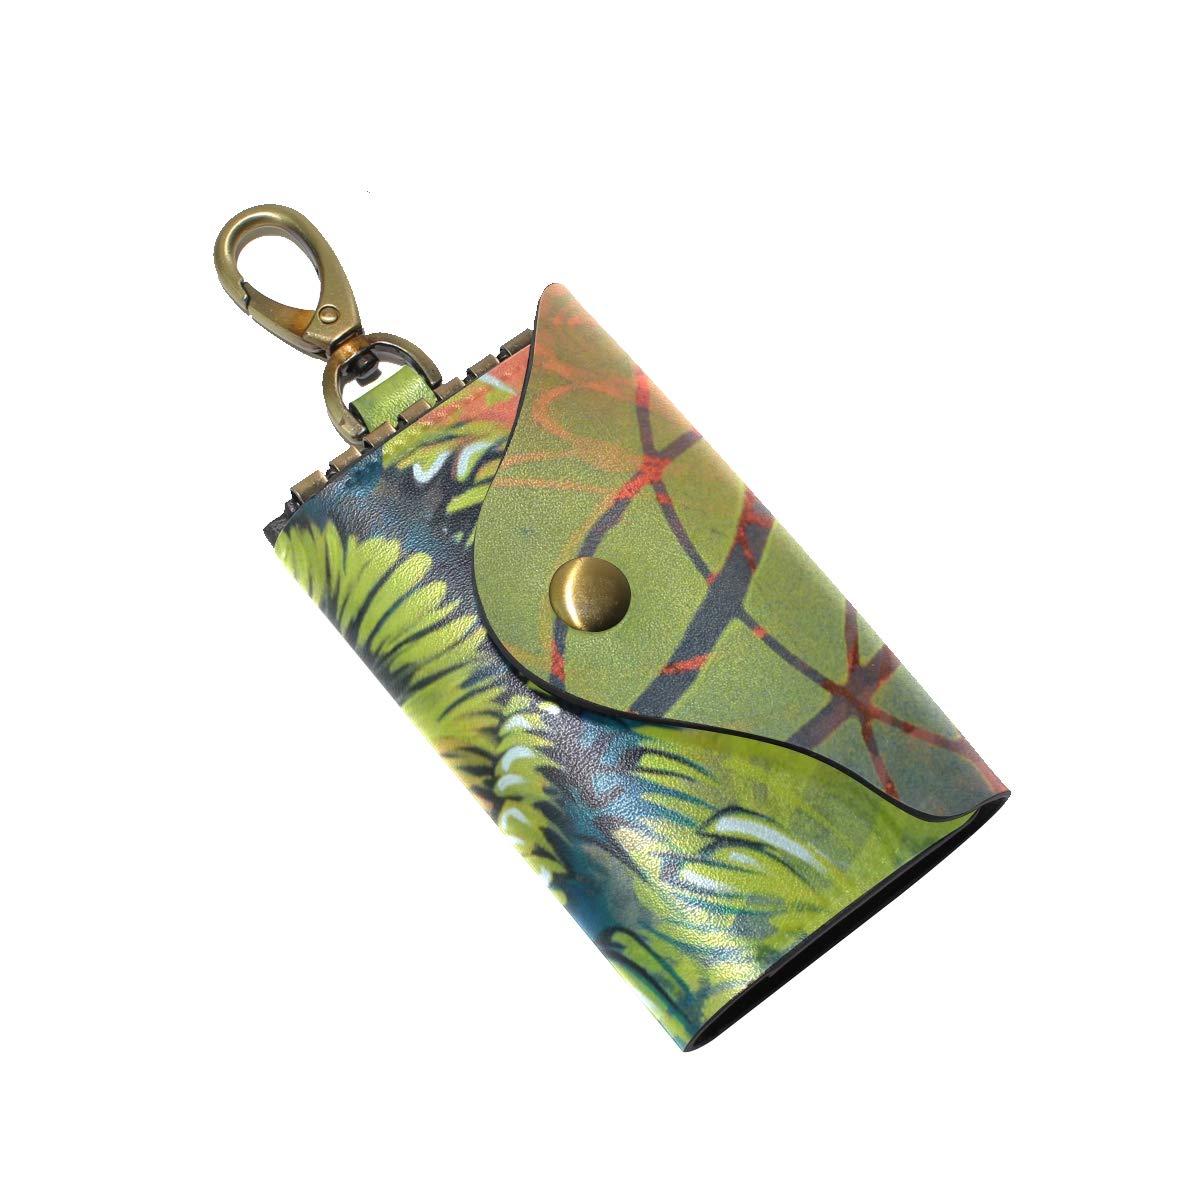 KEAKIA OWL Leather Key Case Wallets Tri-fold Key Holder Keychains with 6 Hooks 2 Slot Snap Closure for Men Women